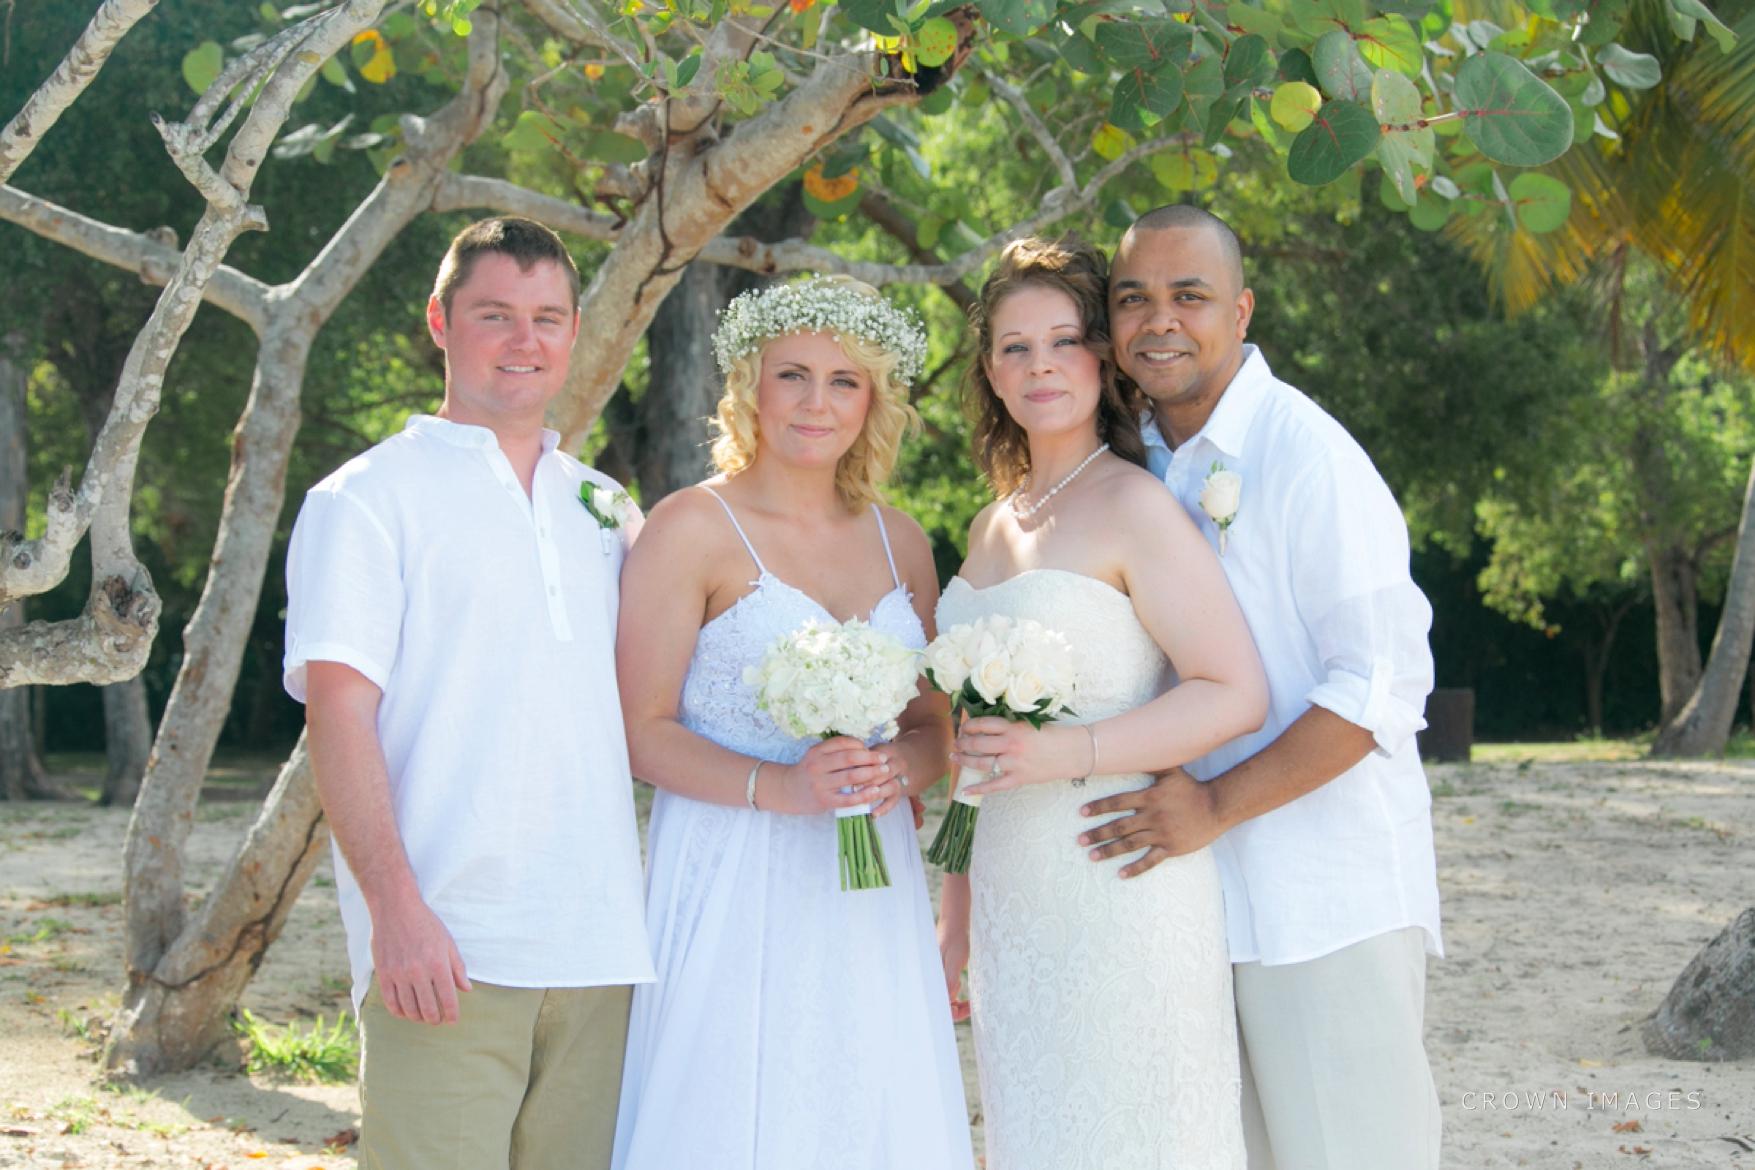 wedding_photos_saint_thomas_crown_images_0575.jpg